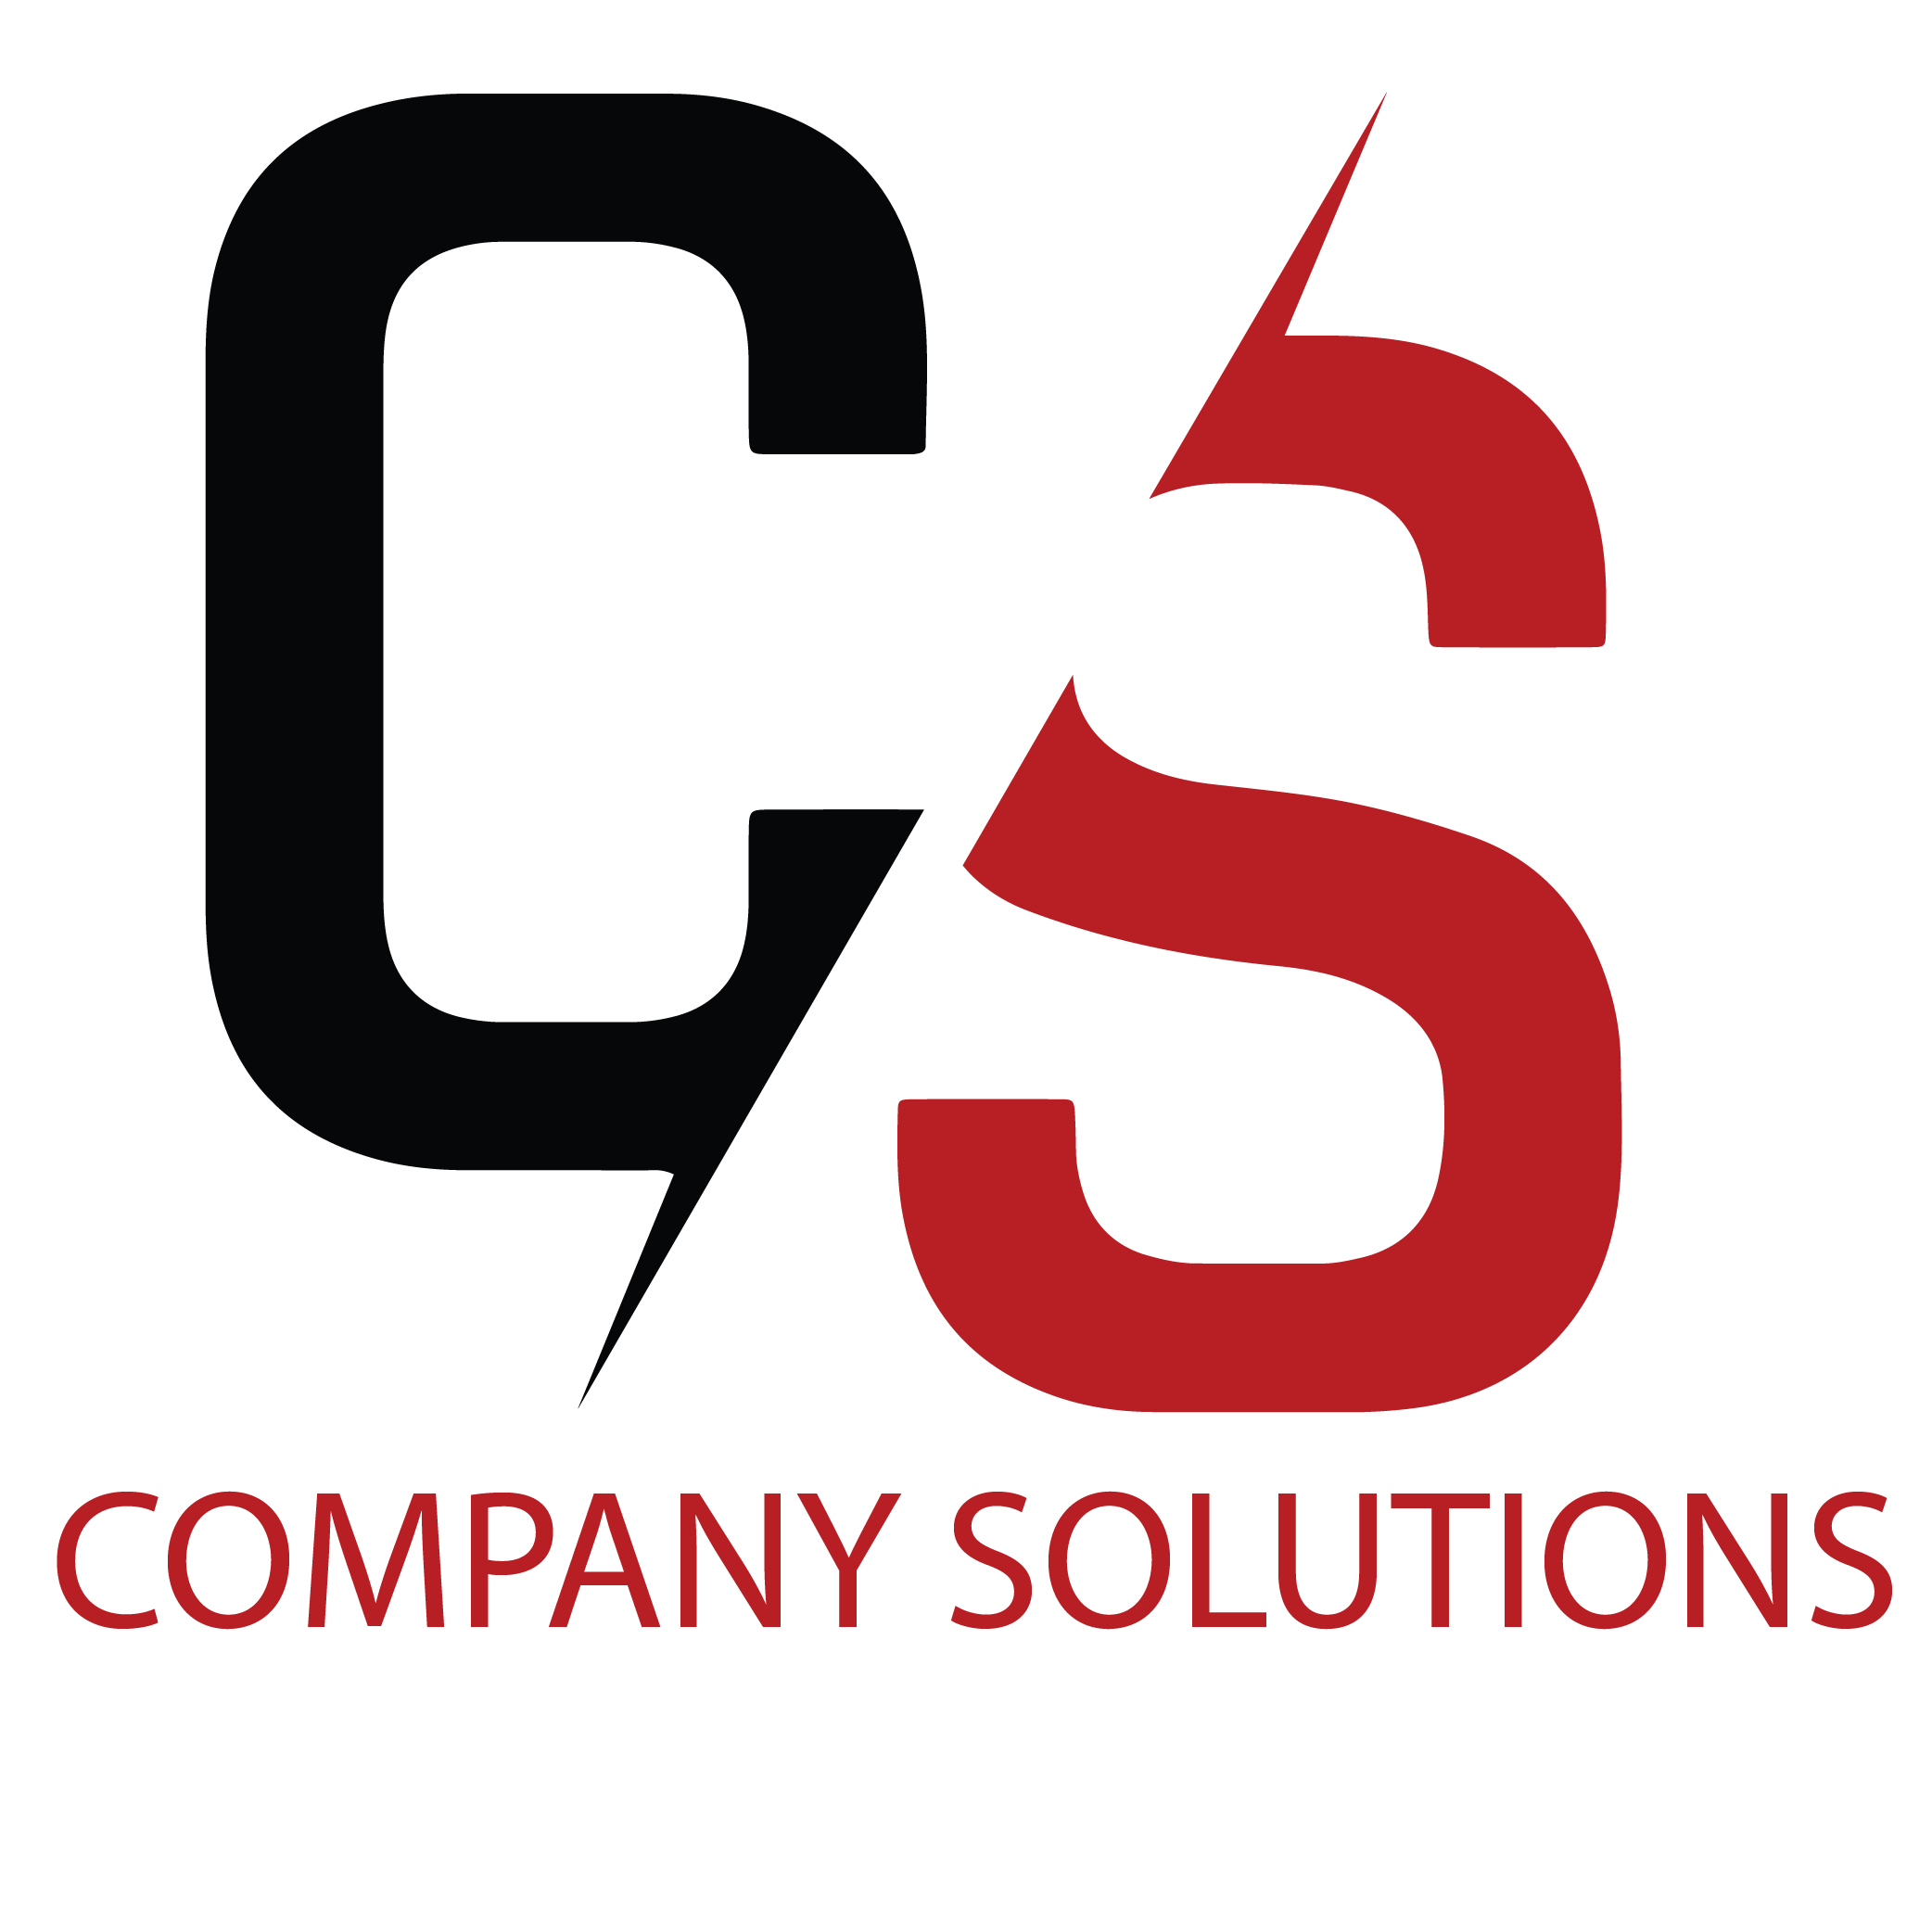 Company Solutions GmbH – Agentur für digitales Marketing